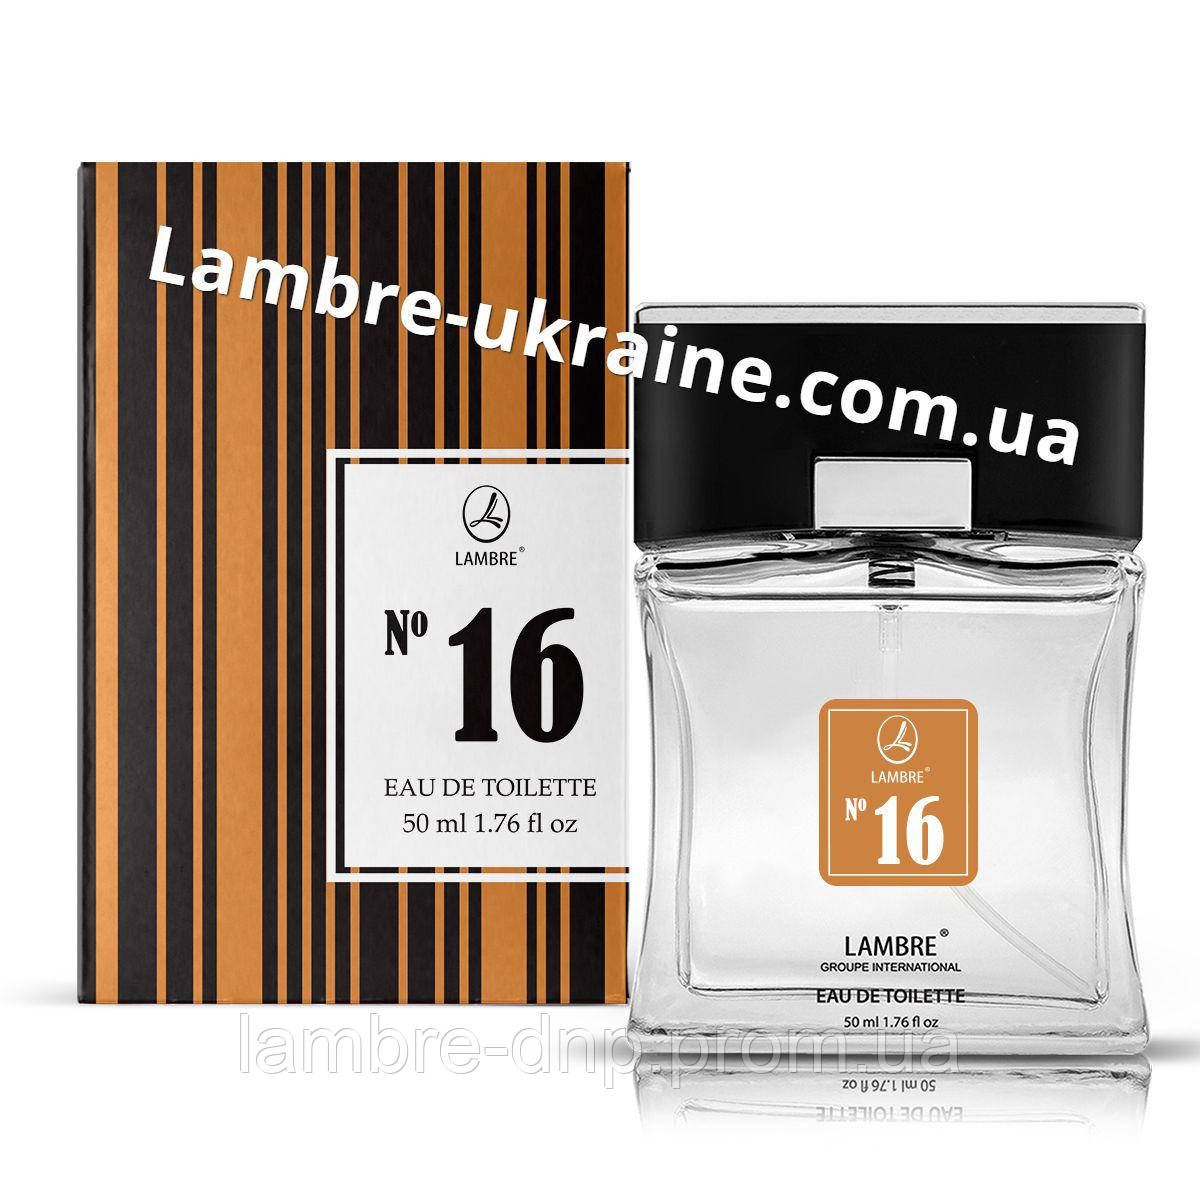 Туалетна вода Lambre (Ламбре) №16 - Bang-bang (Marc Jacobs) - 50мл.